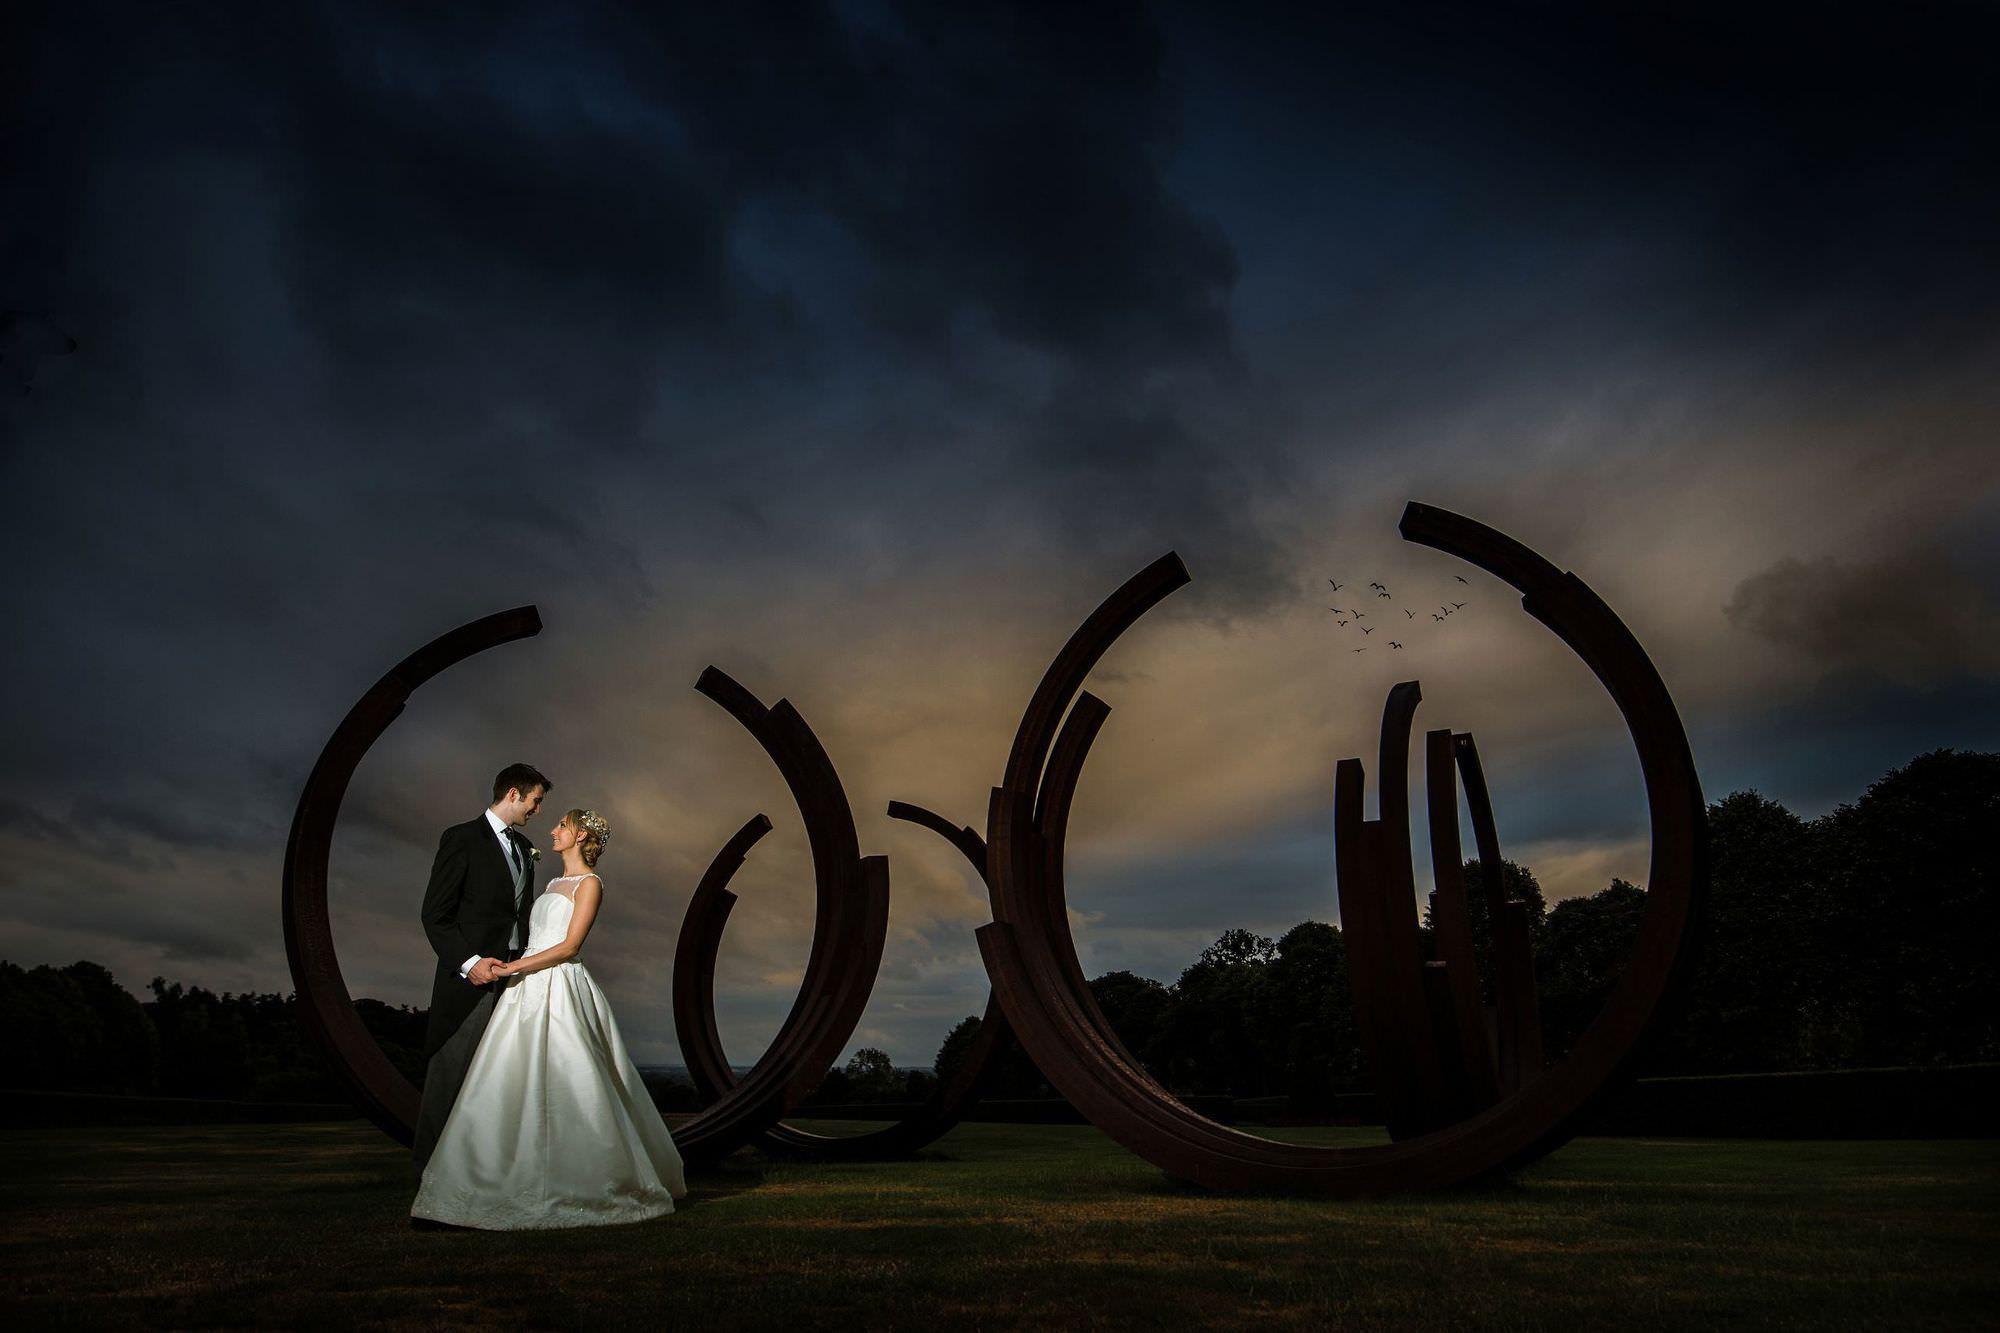 Mark-Seymour-Wedding-Photographer-UK-22 11